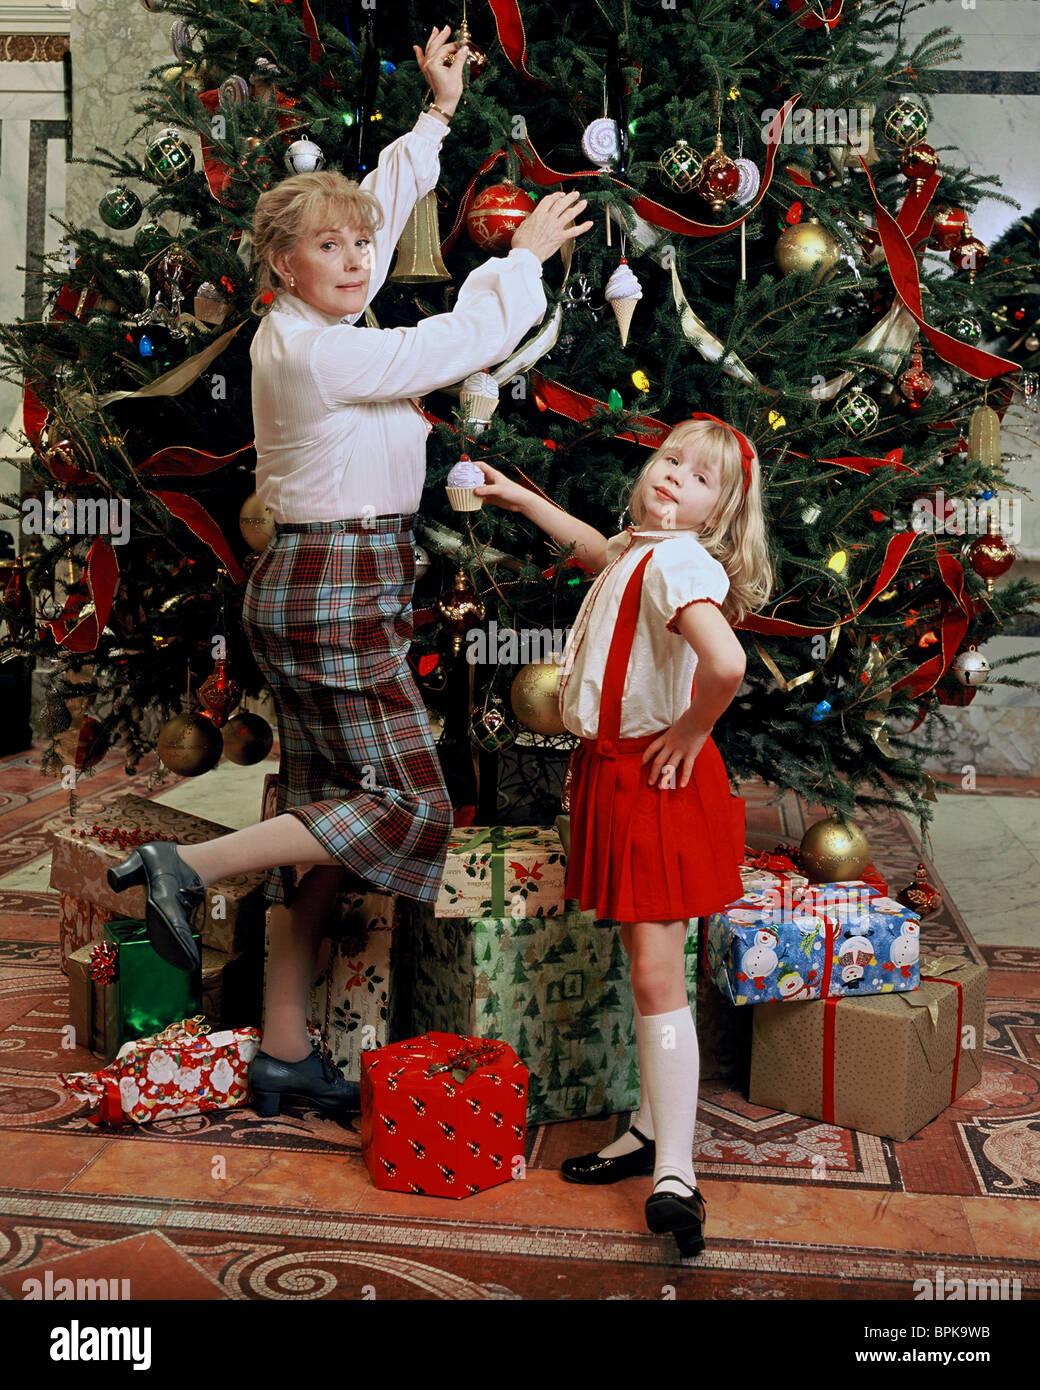 JULIE ANDREWS & SOFIA VASSILIEVA ELOISE AT CHRISTMASTIME (2003 Stock ...